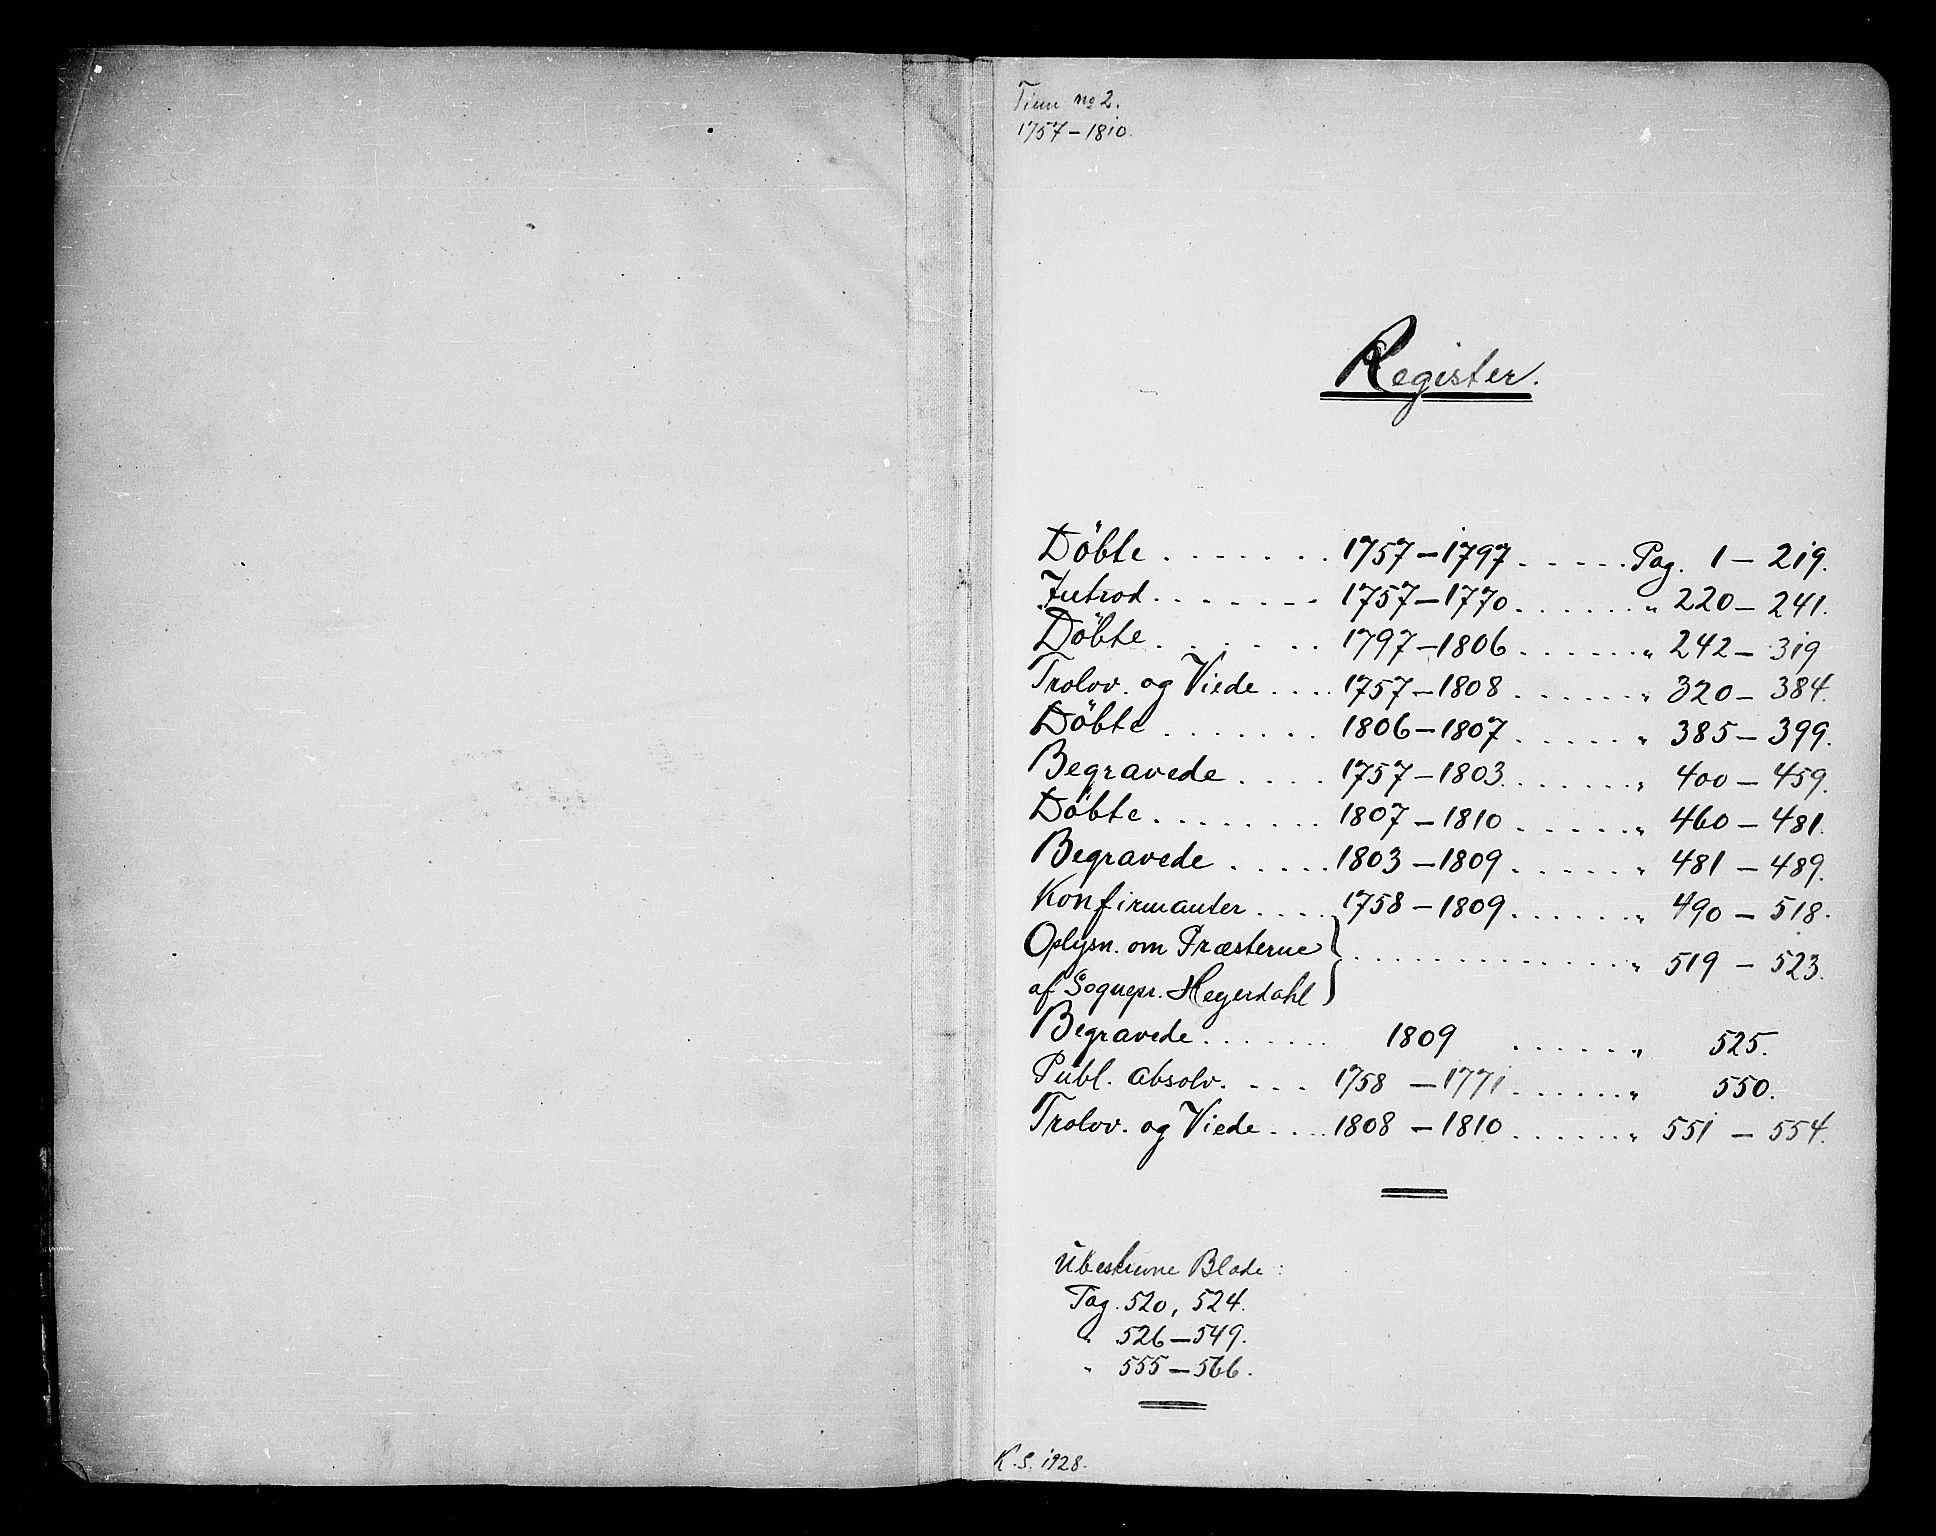 SAKO, Tinn kirkebøker, F/Fa/L0002: Ministerialbok nr. I 2, 1757-1810